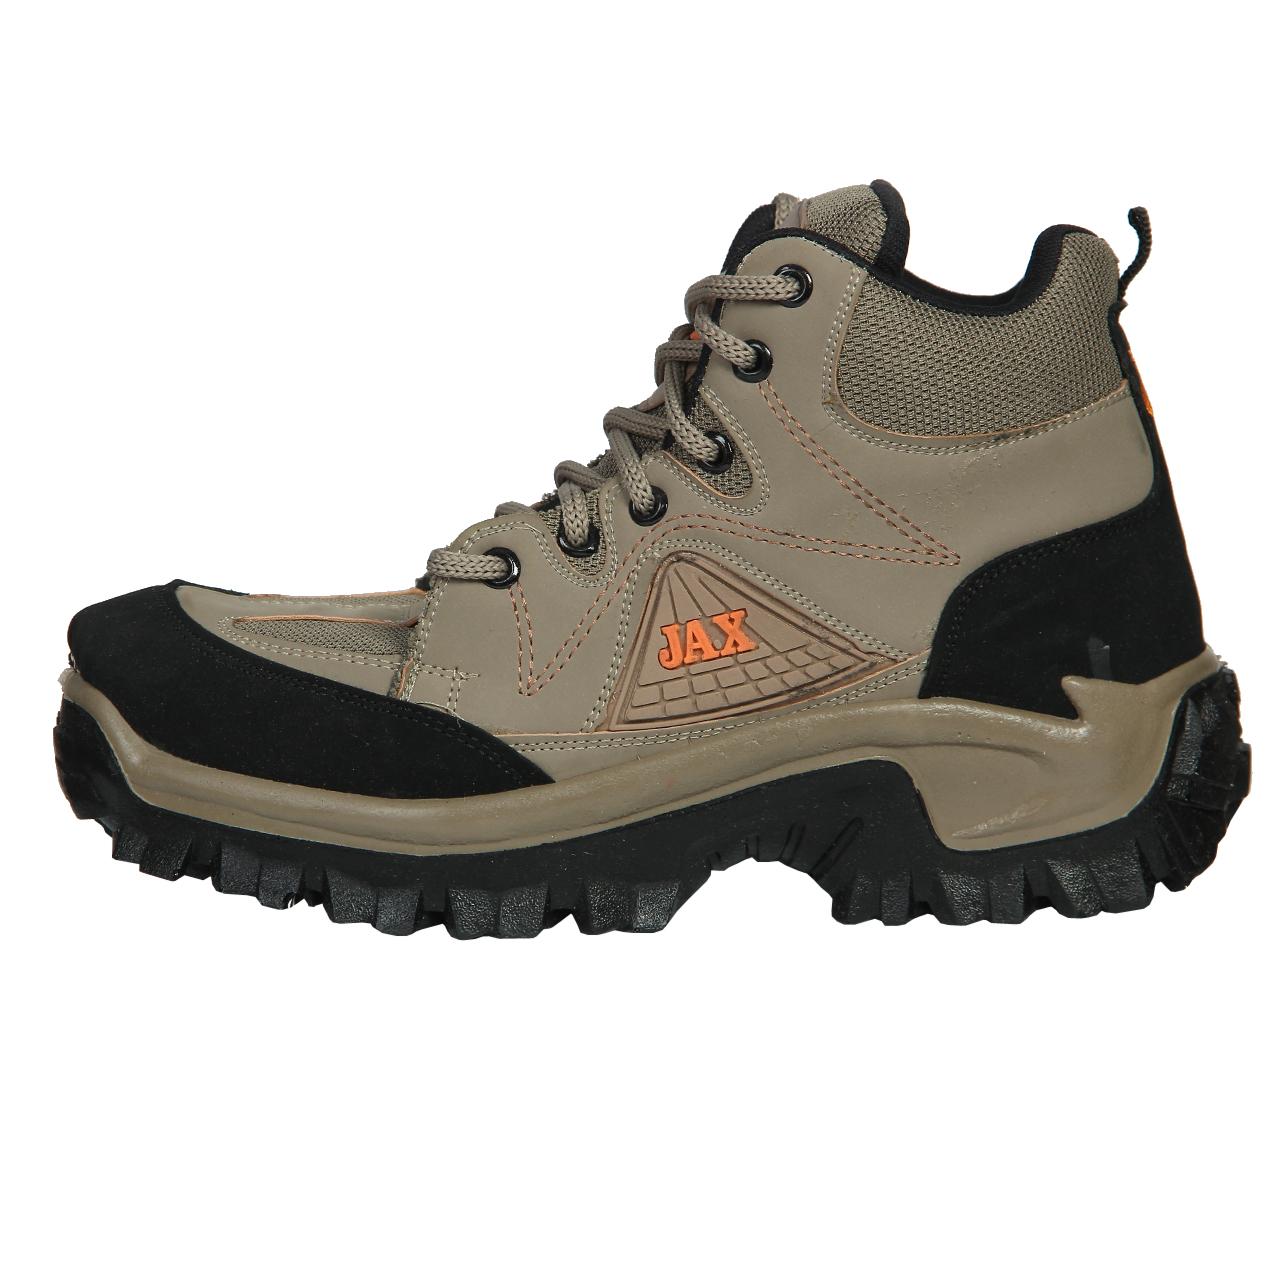 خرید                     کفش کوهنوردی مدل jax کد 5855